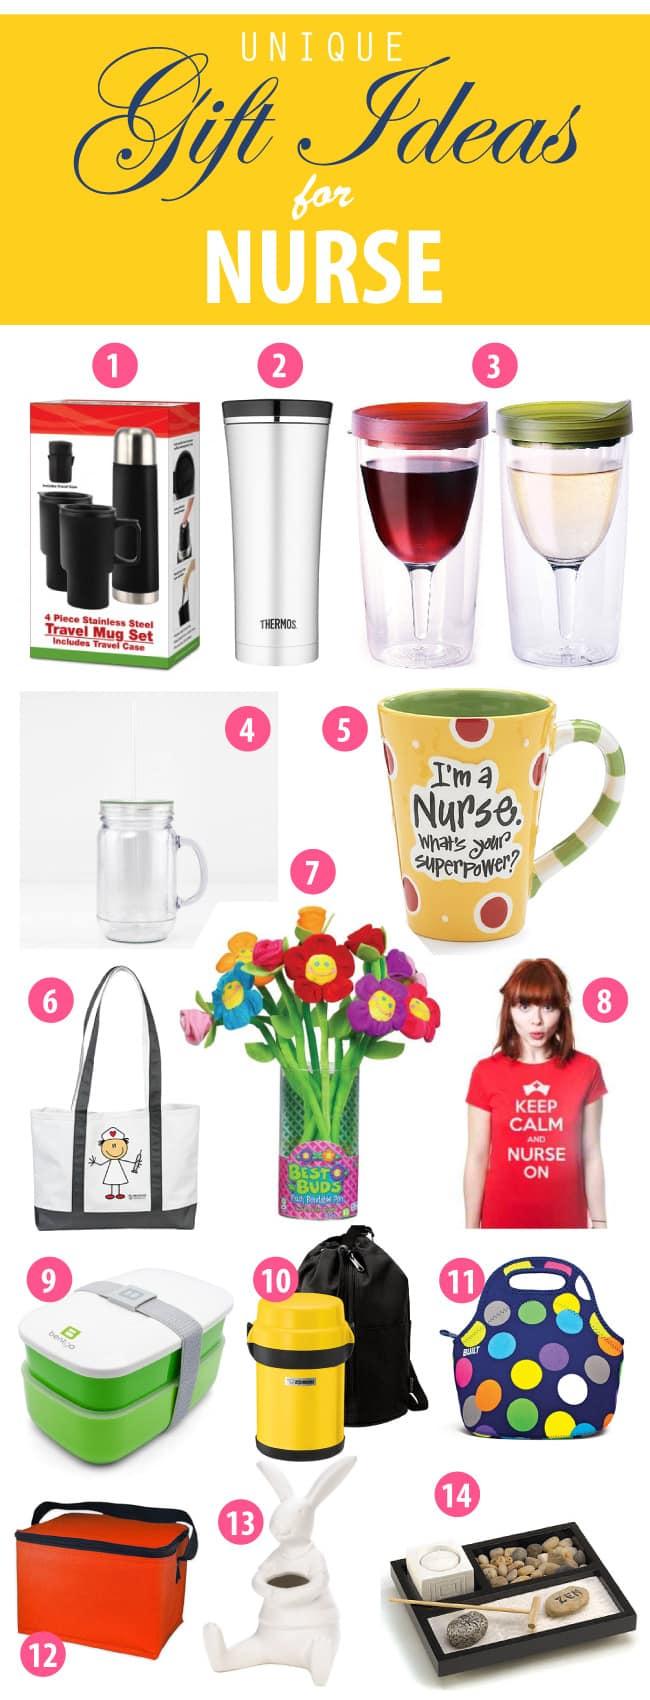 Nurse Gifts  sc 1 st  BestHolidayDeals.CO & Gift Ideas For Nurses - BestHolidayDeals.CO